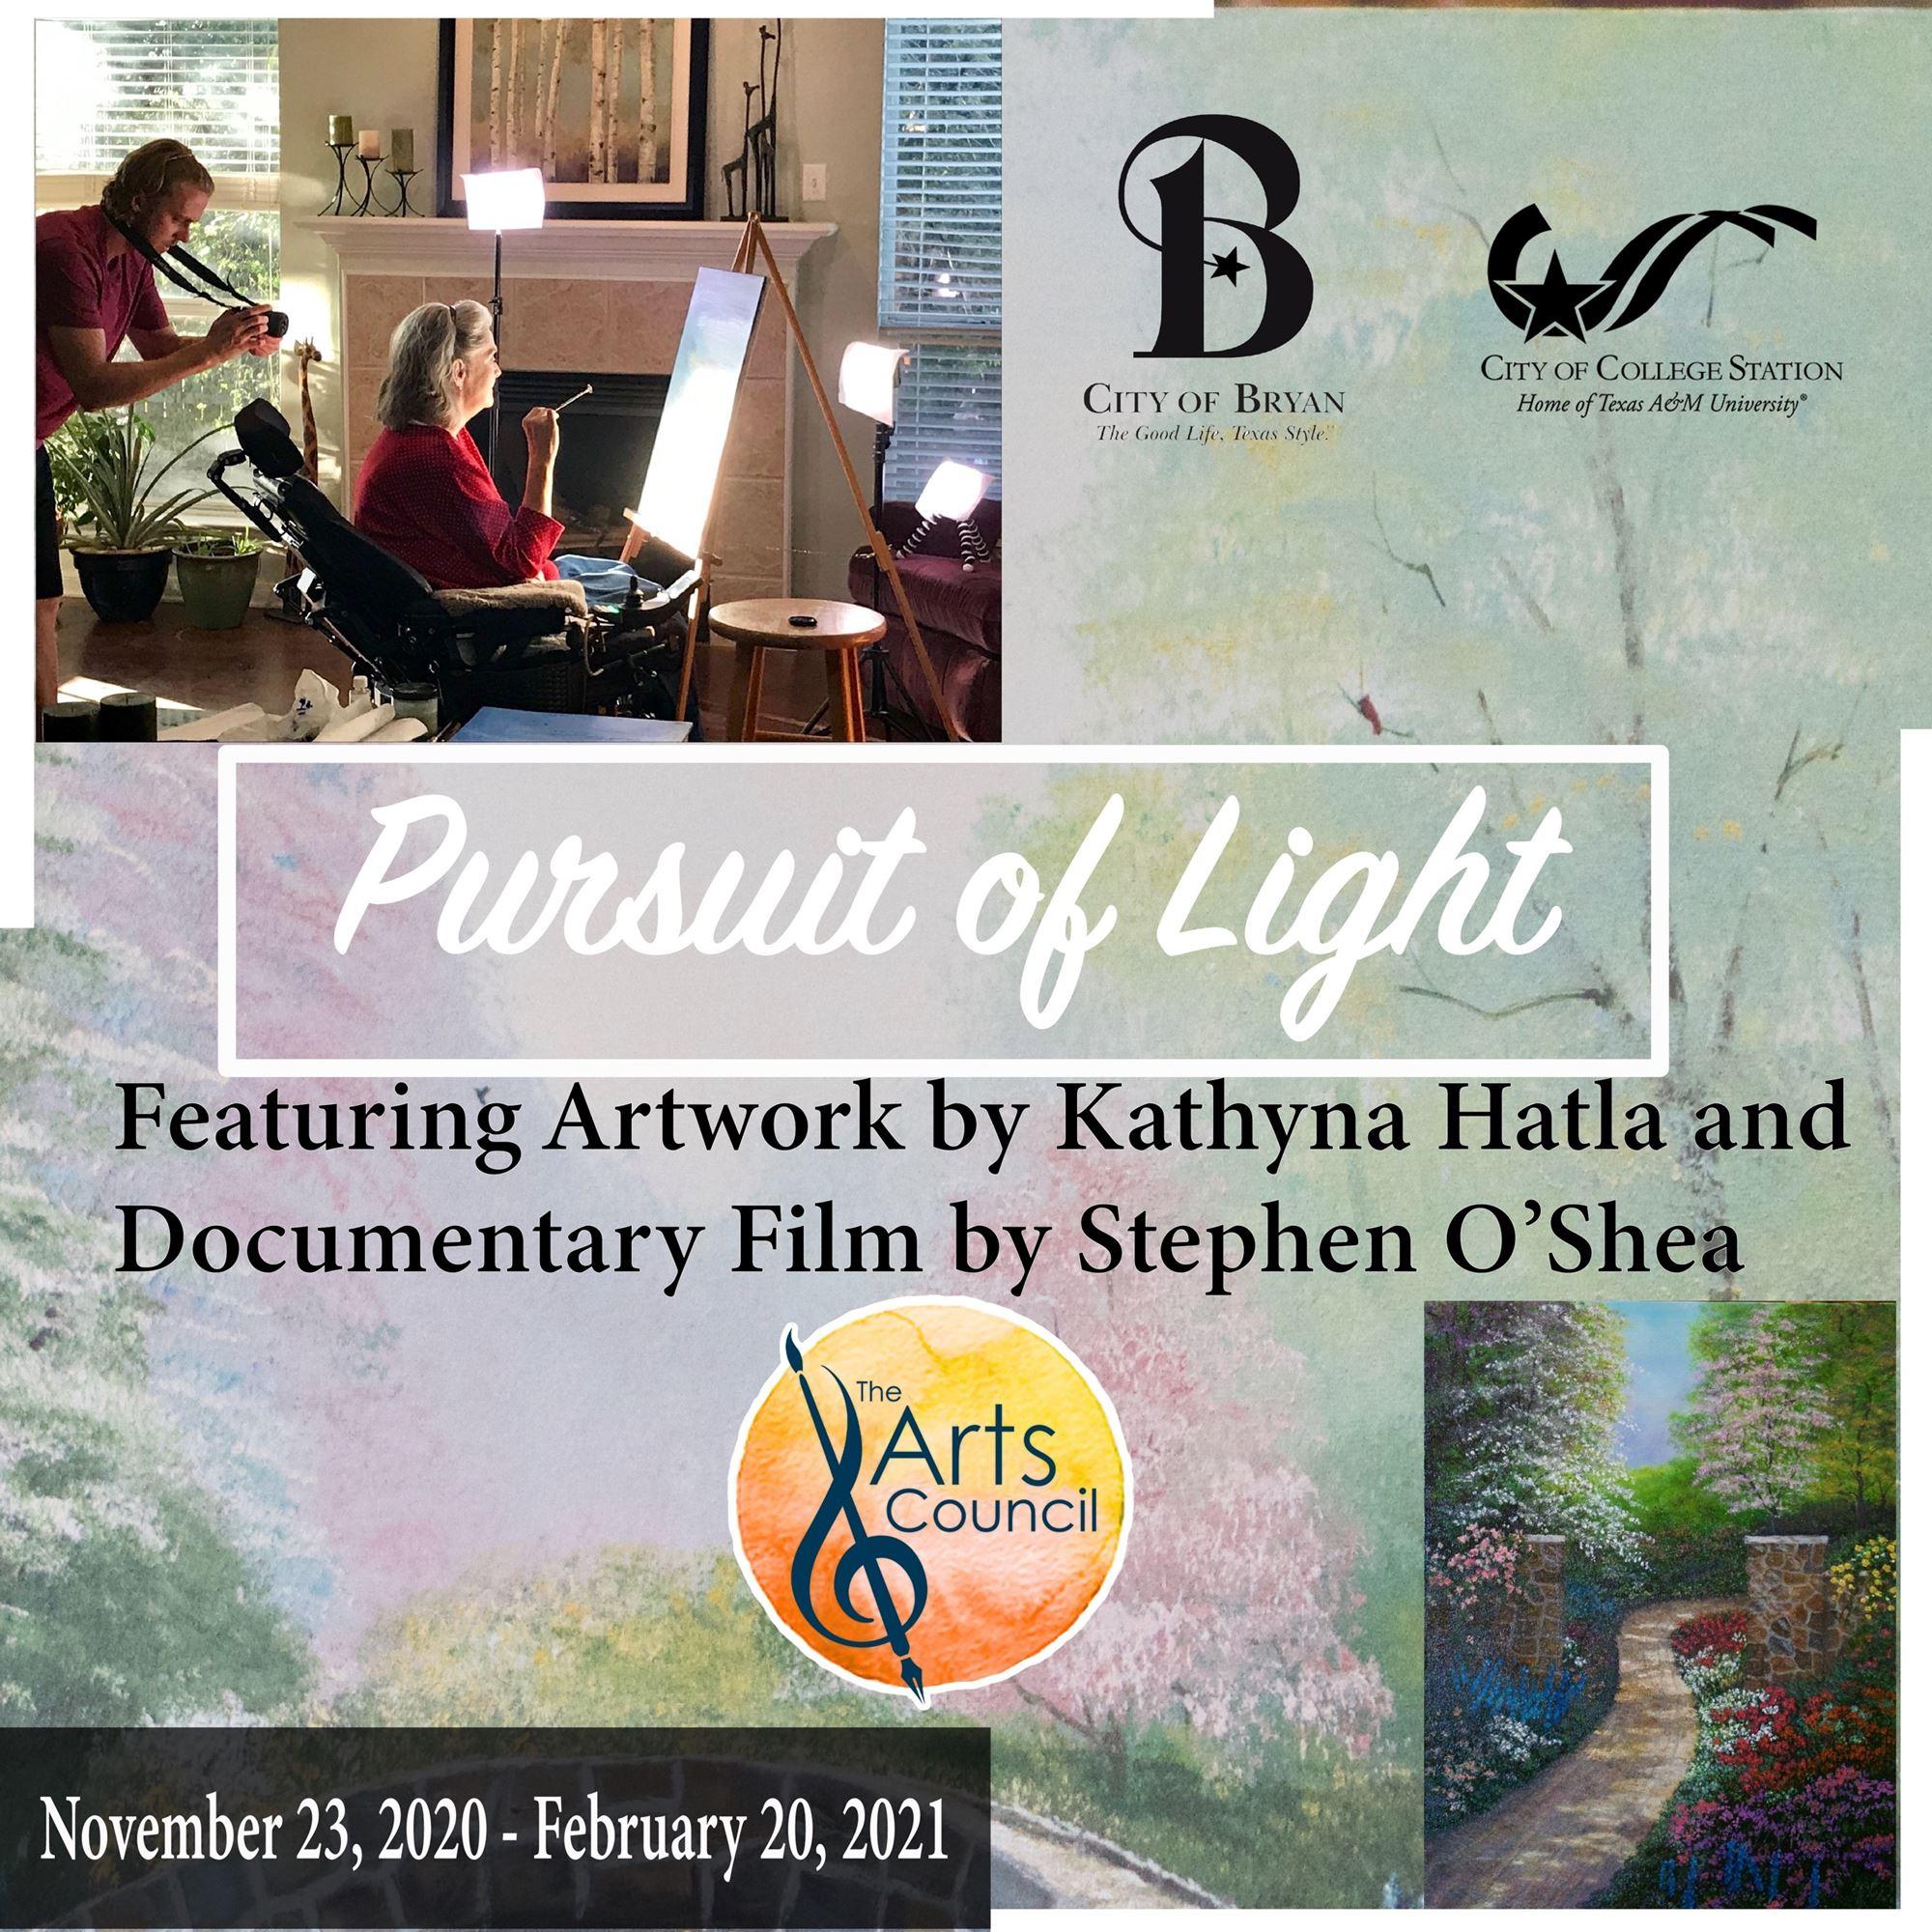 Pursuit of Light